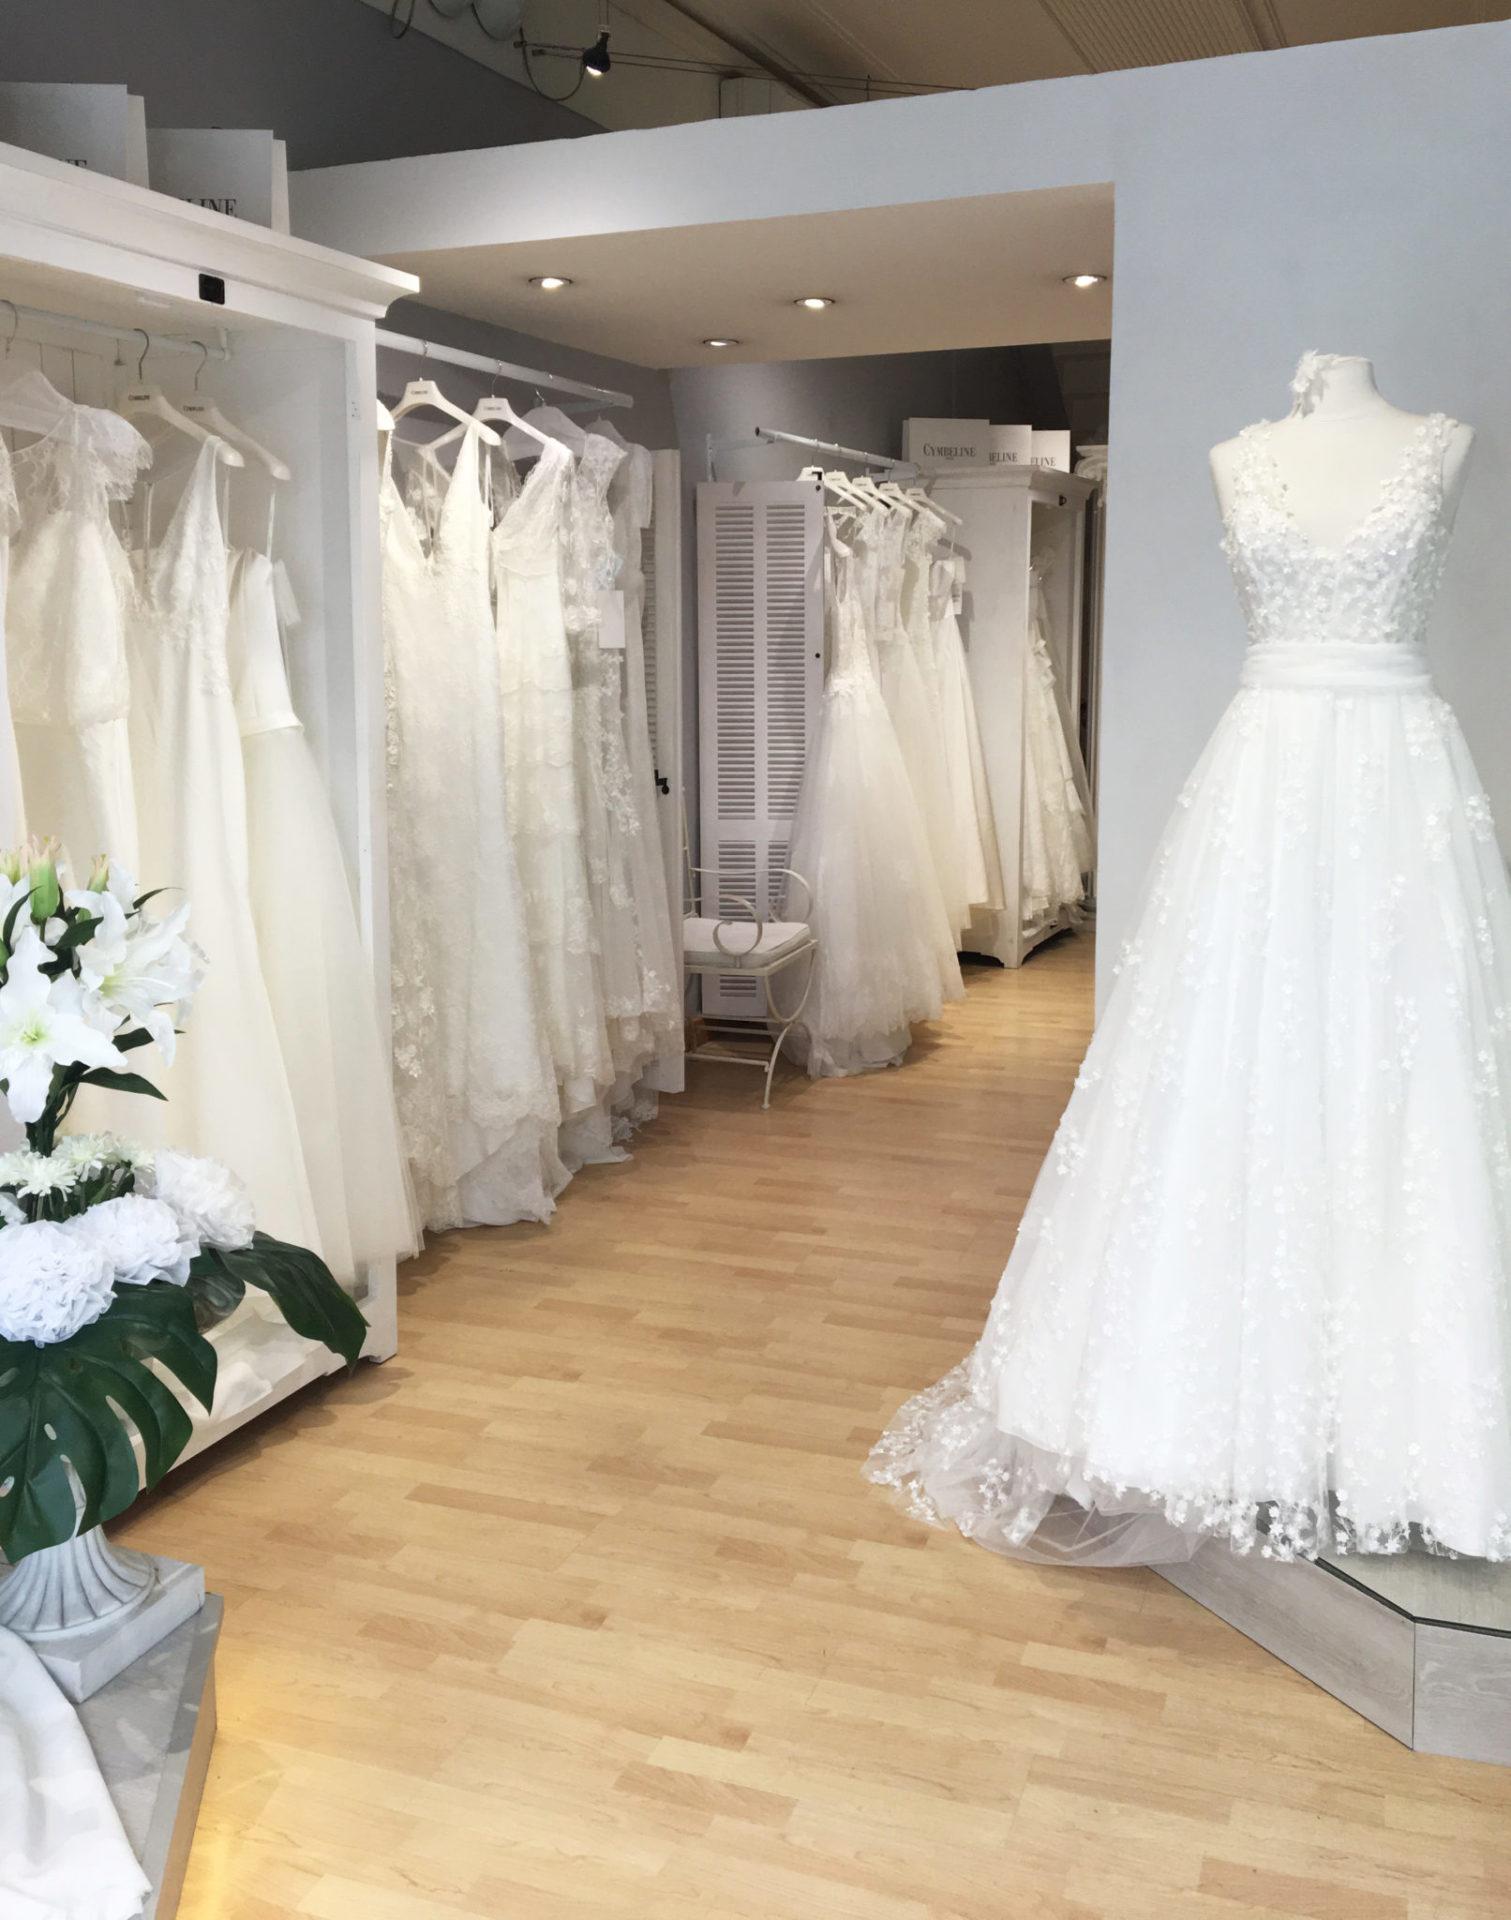 Cymbeline Clermont-ferrand - Boutique Robe